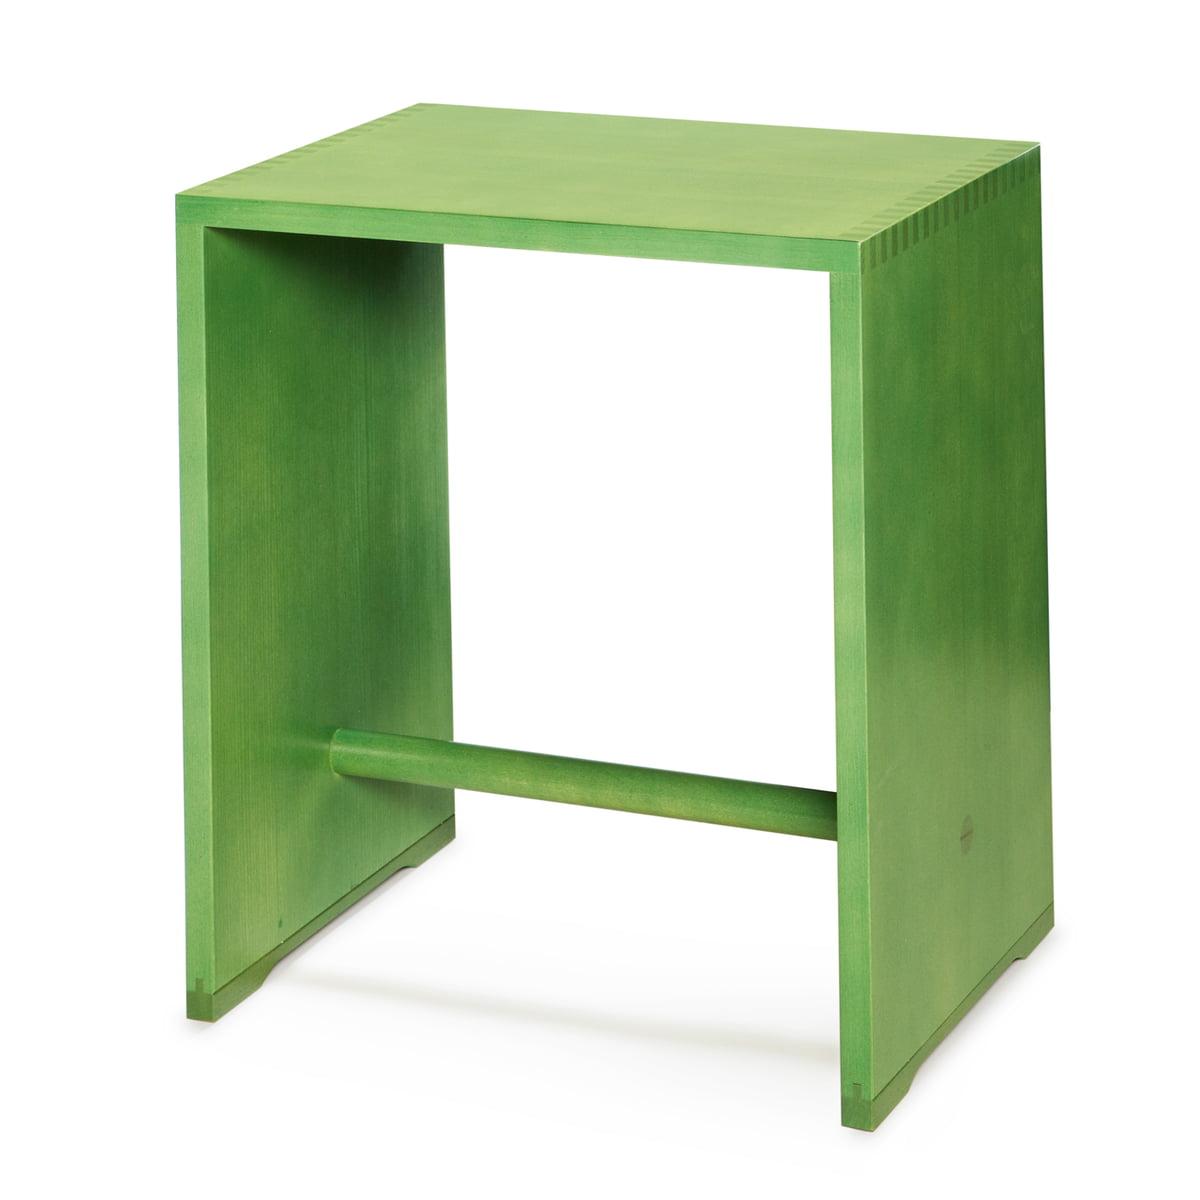 ulmer hocker farbig von max bill. Black Bedroom Furniture Sets. Home Design Ideas